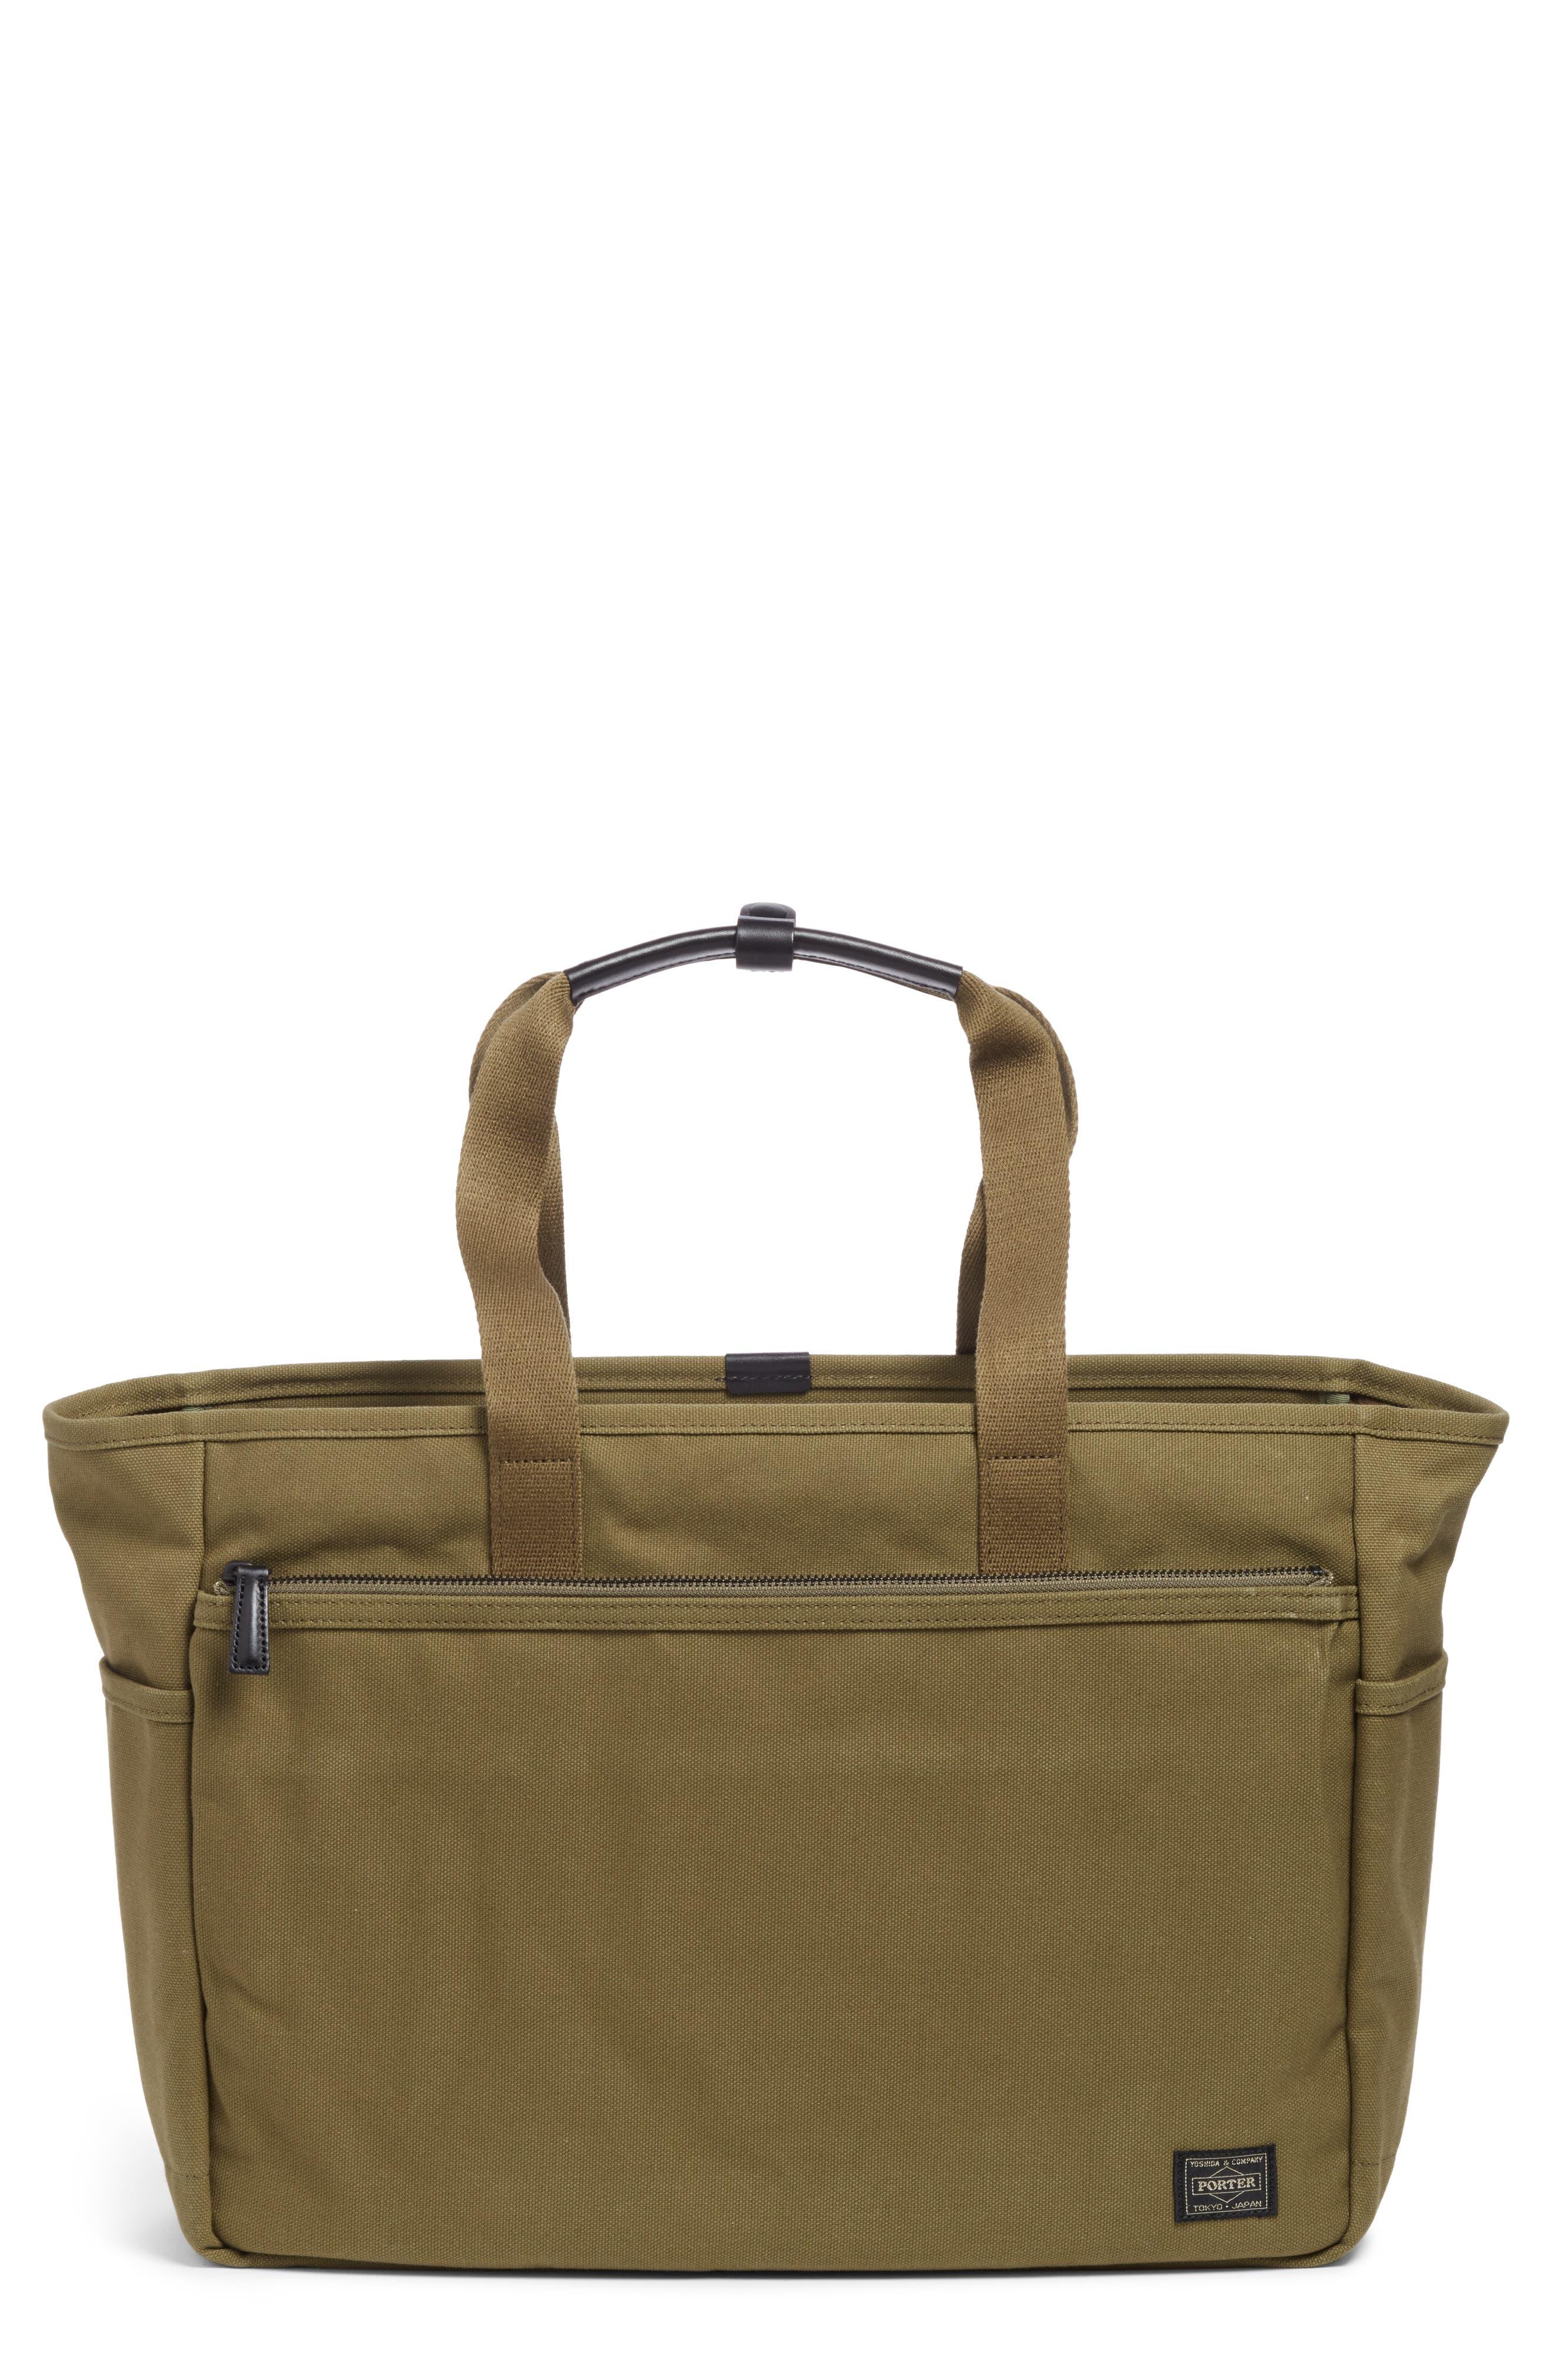 x Porter Travel Tote Bag,                             Main thumbnail 1, color,                             OLIVE